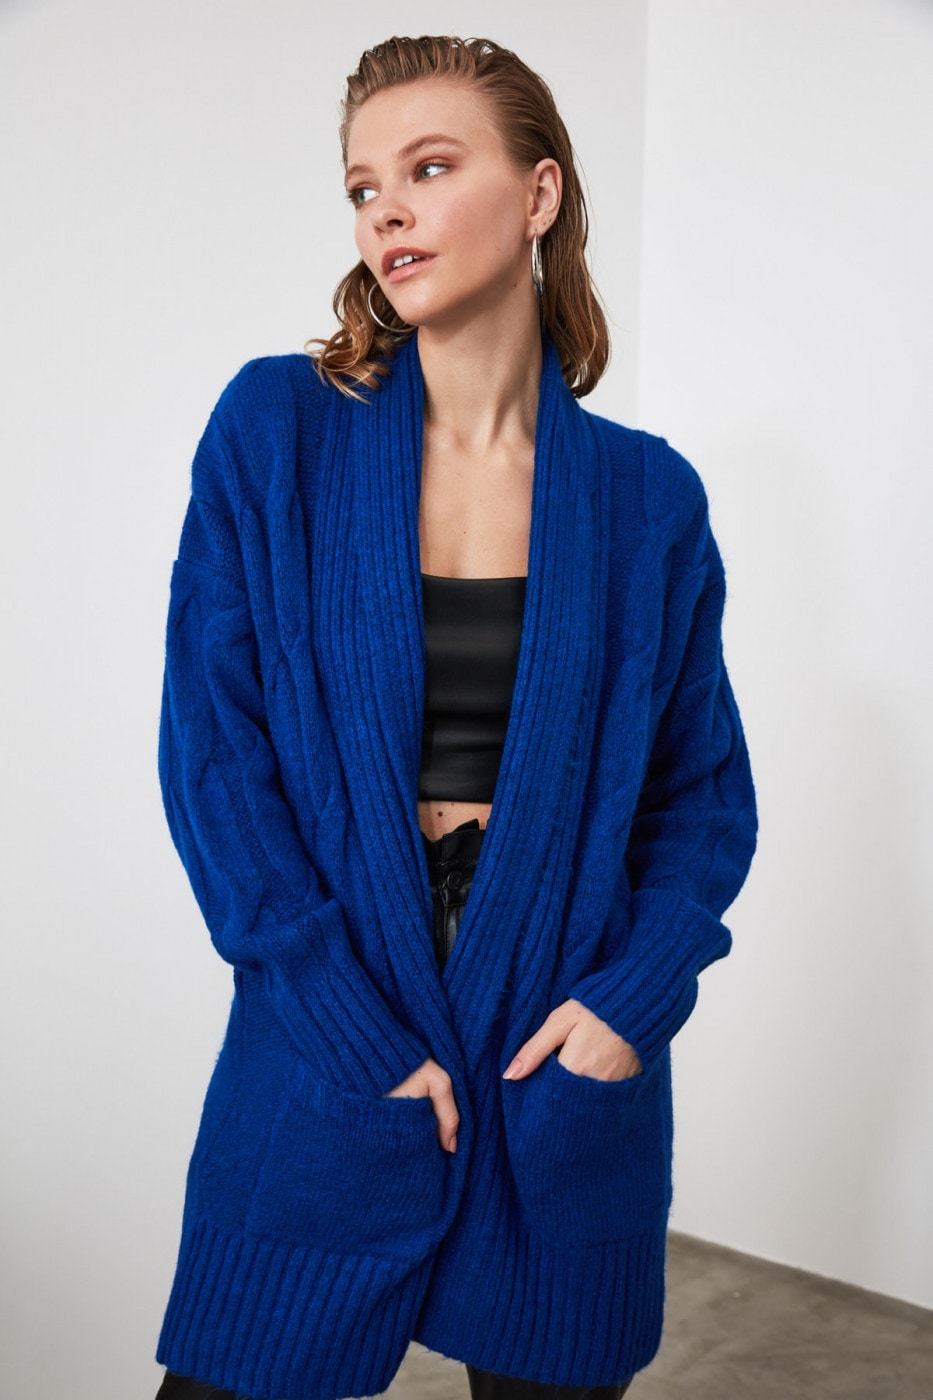 Trendyol Saks Braid Detailed Knitwear Cardigan